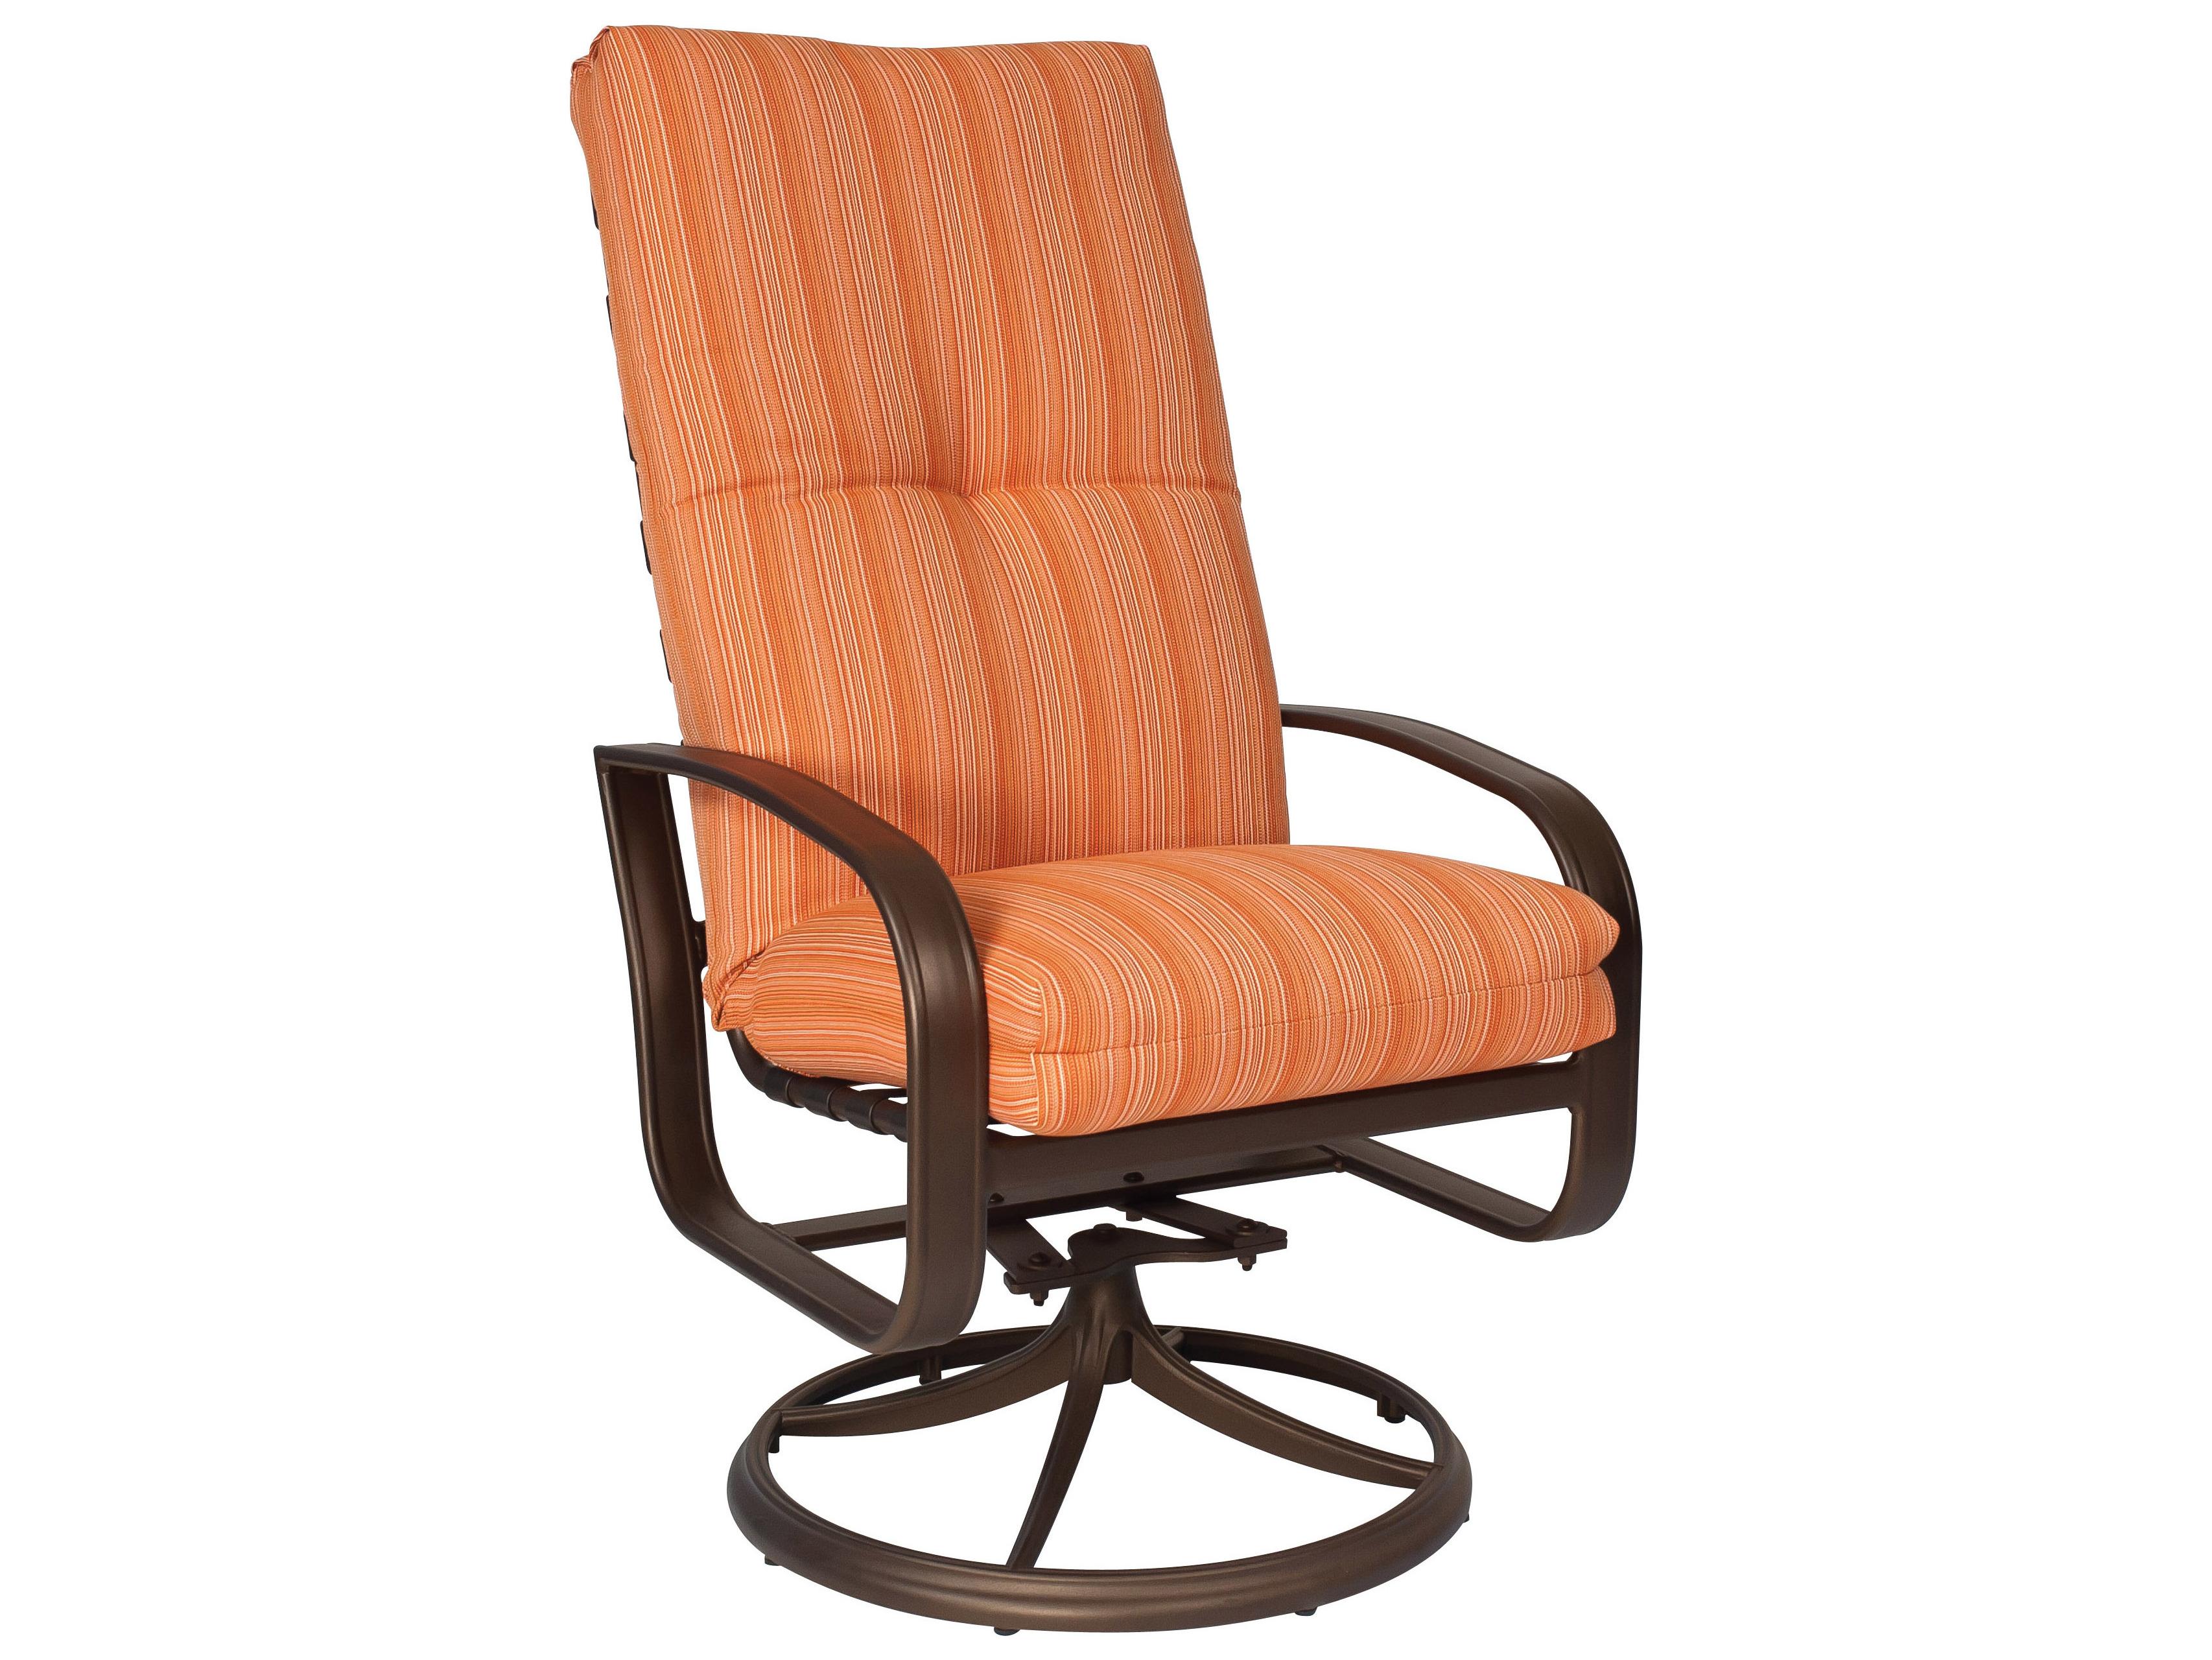 woodard cayman isle high back swivel rocker chair replacement cushions